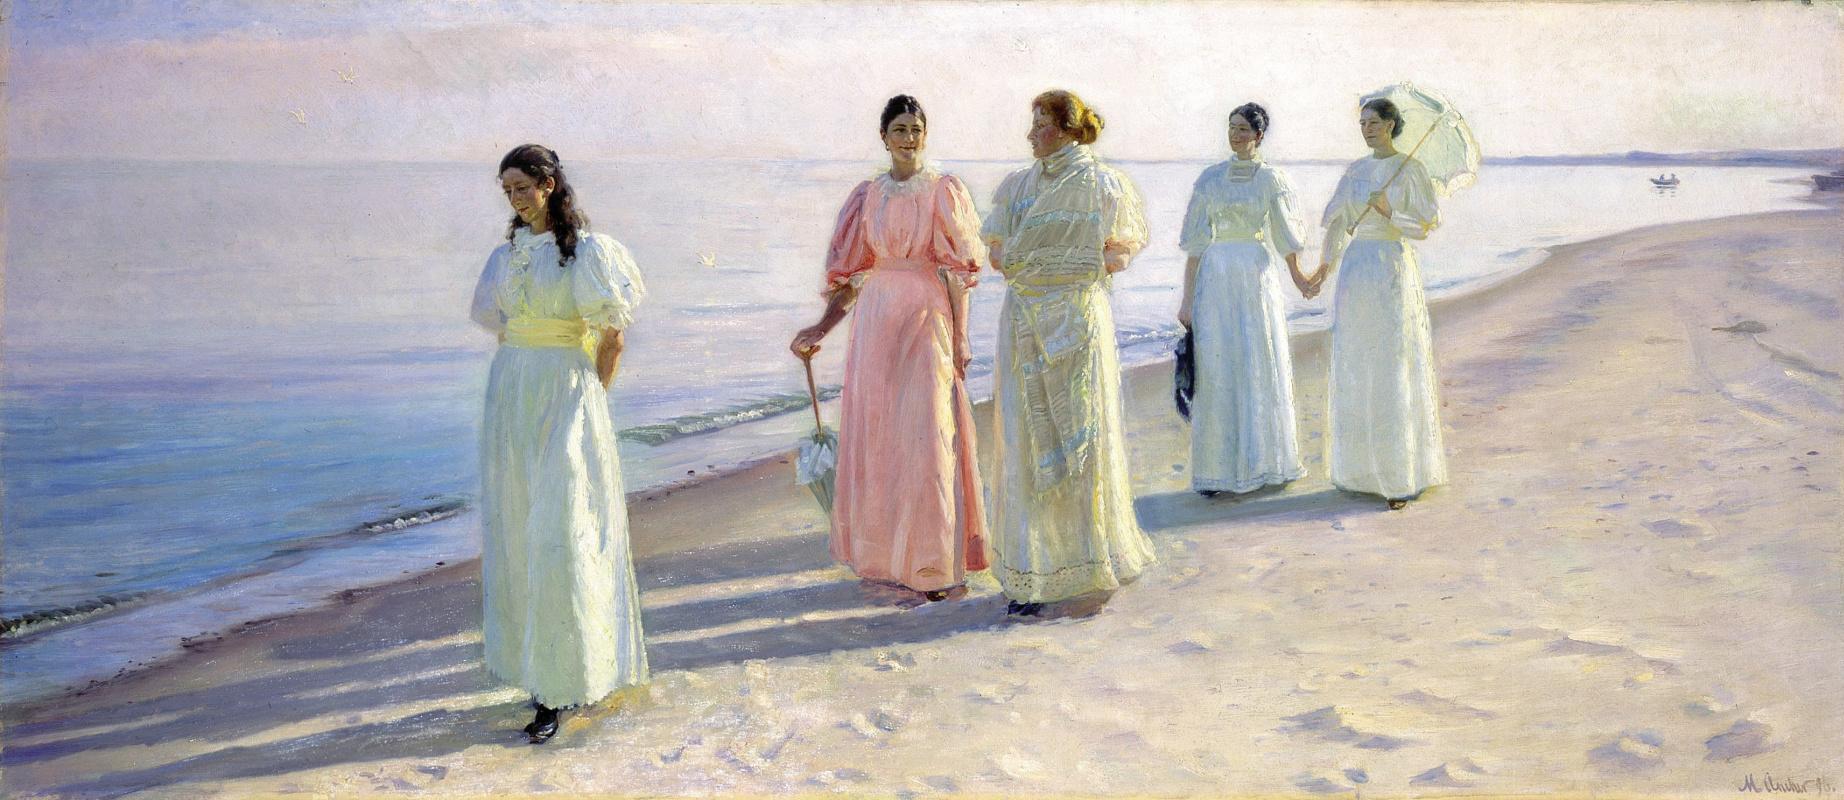 Микаэль Питер Анкер. Прогулка по пляжу